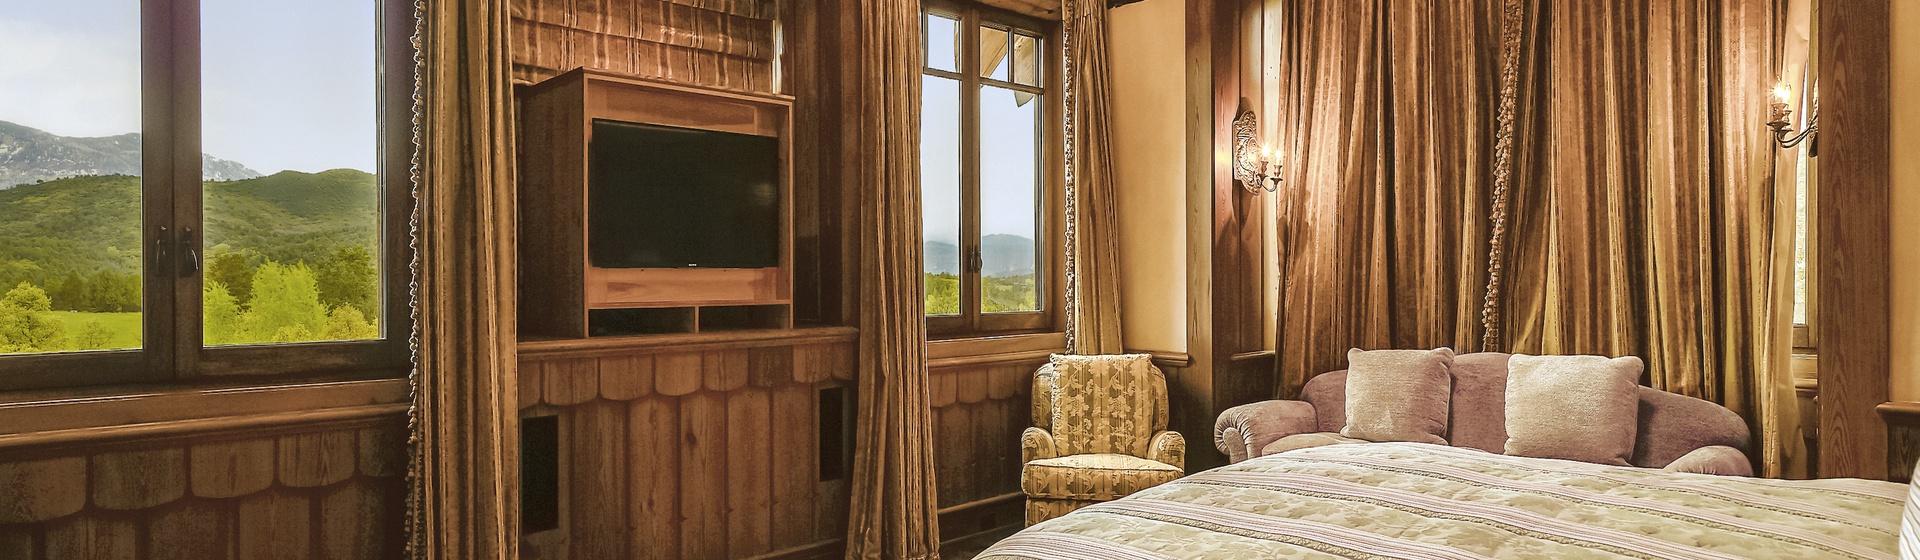 9.8-Telluride-Sleeping-Indian-Ranch-Swiss-Suite-Master-Bedroom-I-web.JPG